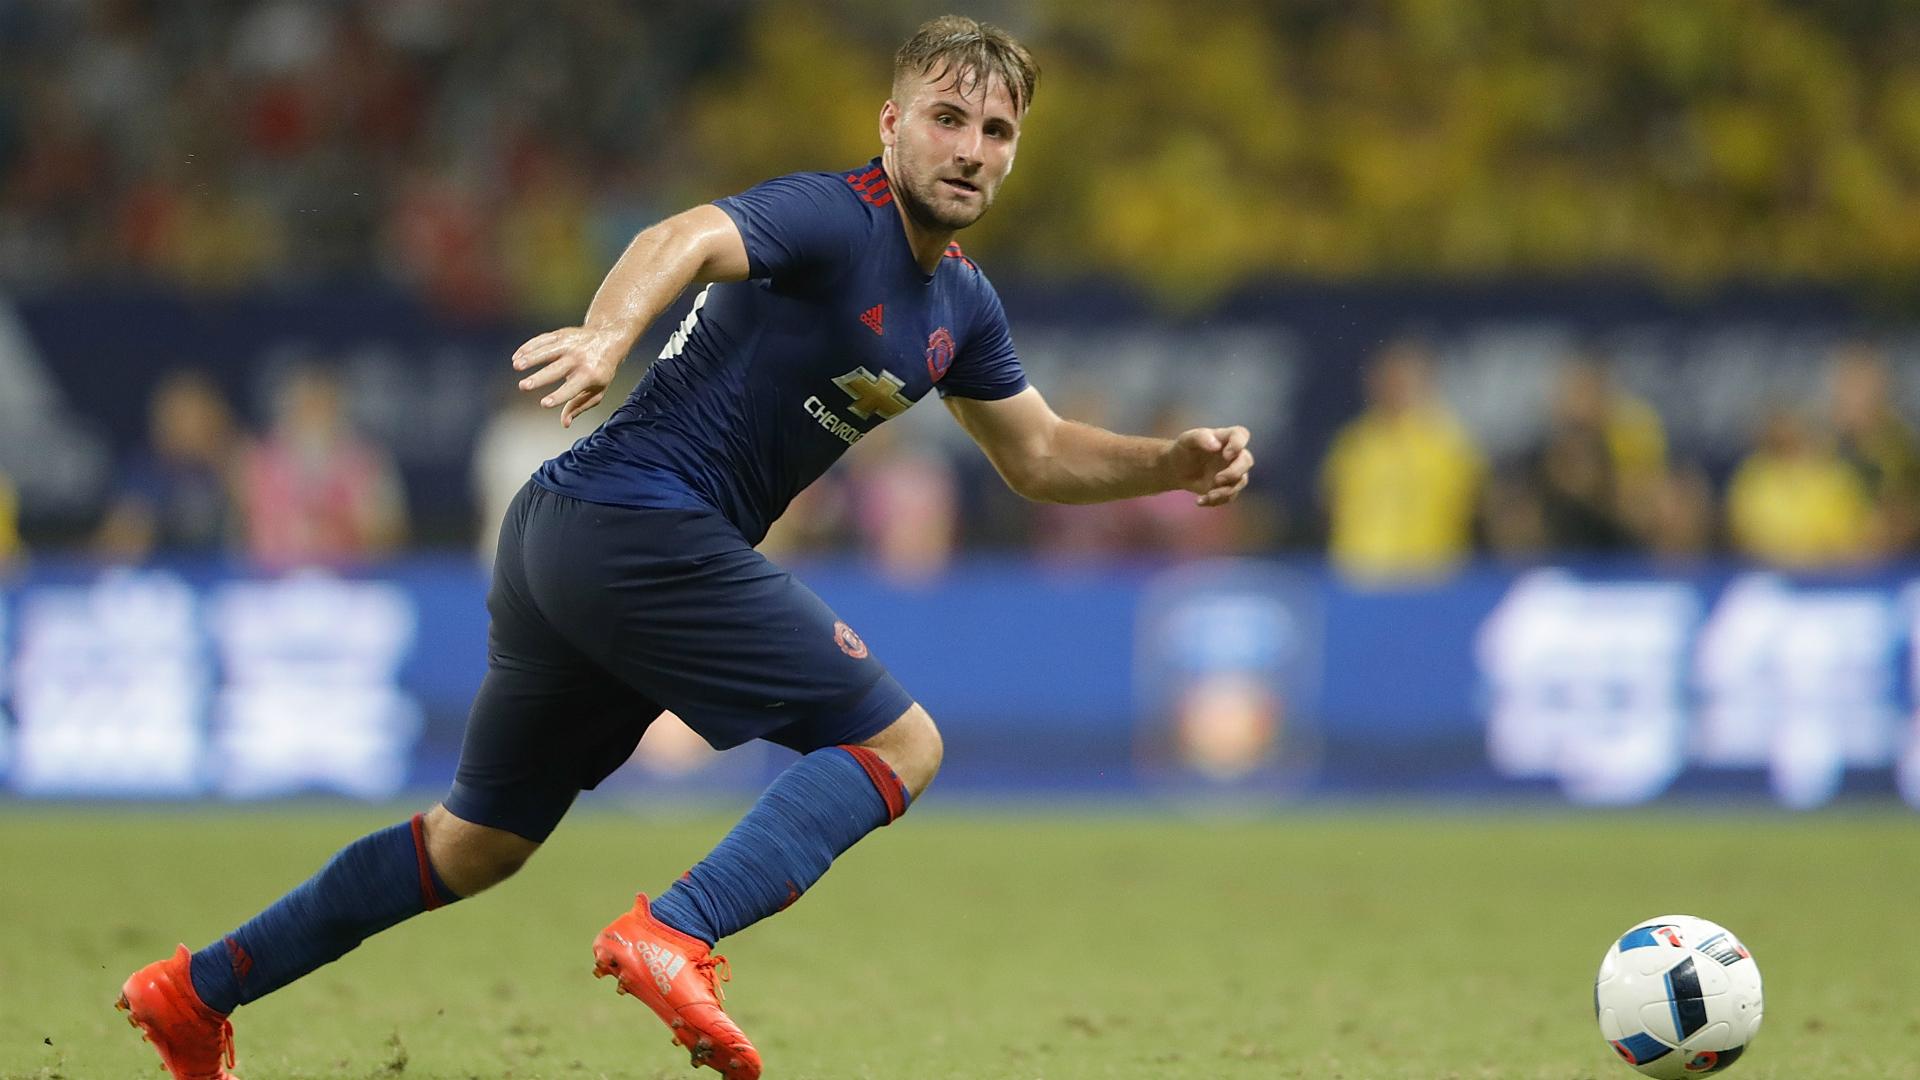 Guardiola to shake on renewed Mourinho rivalry